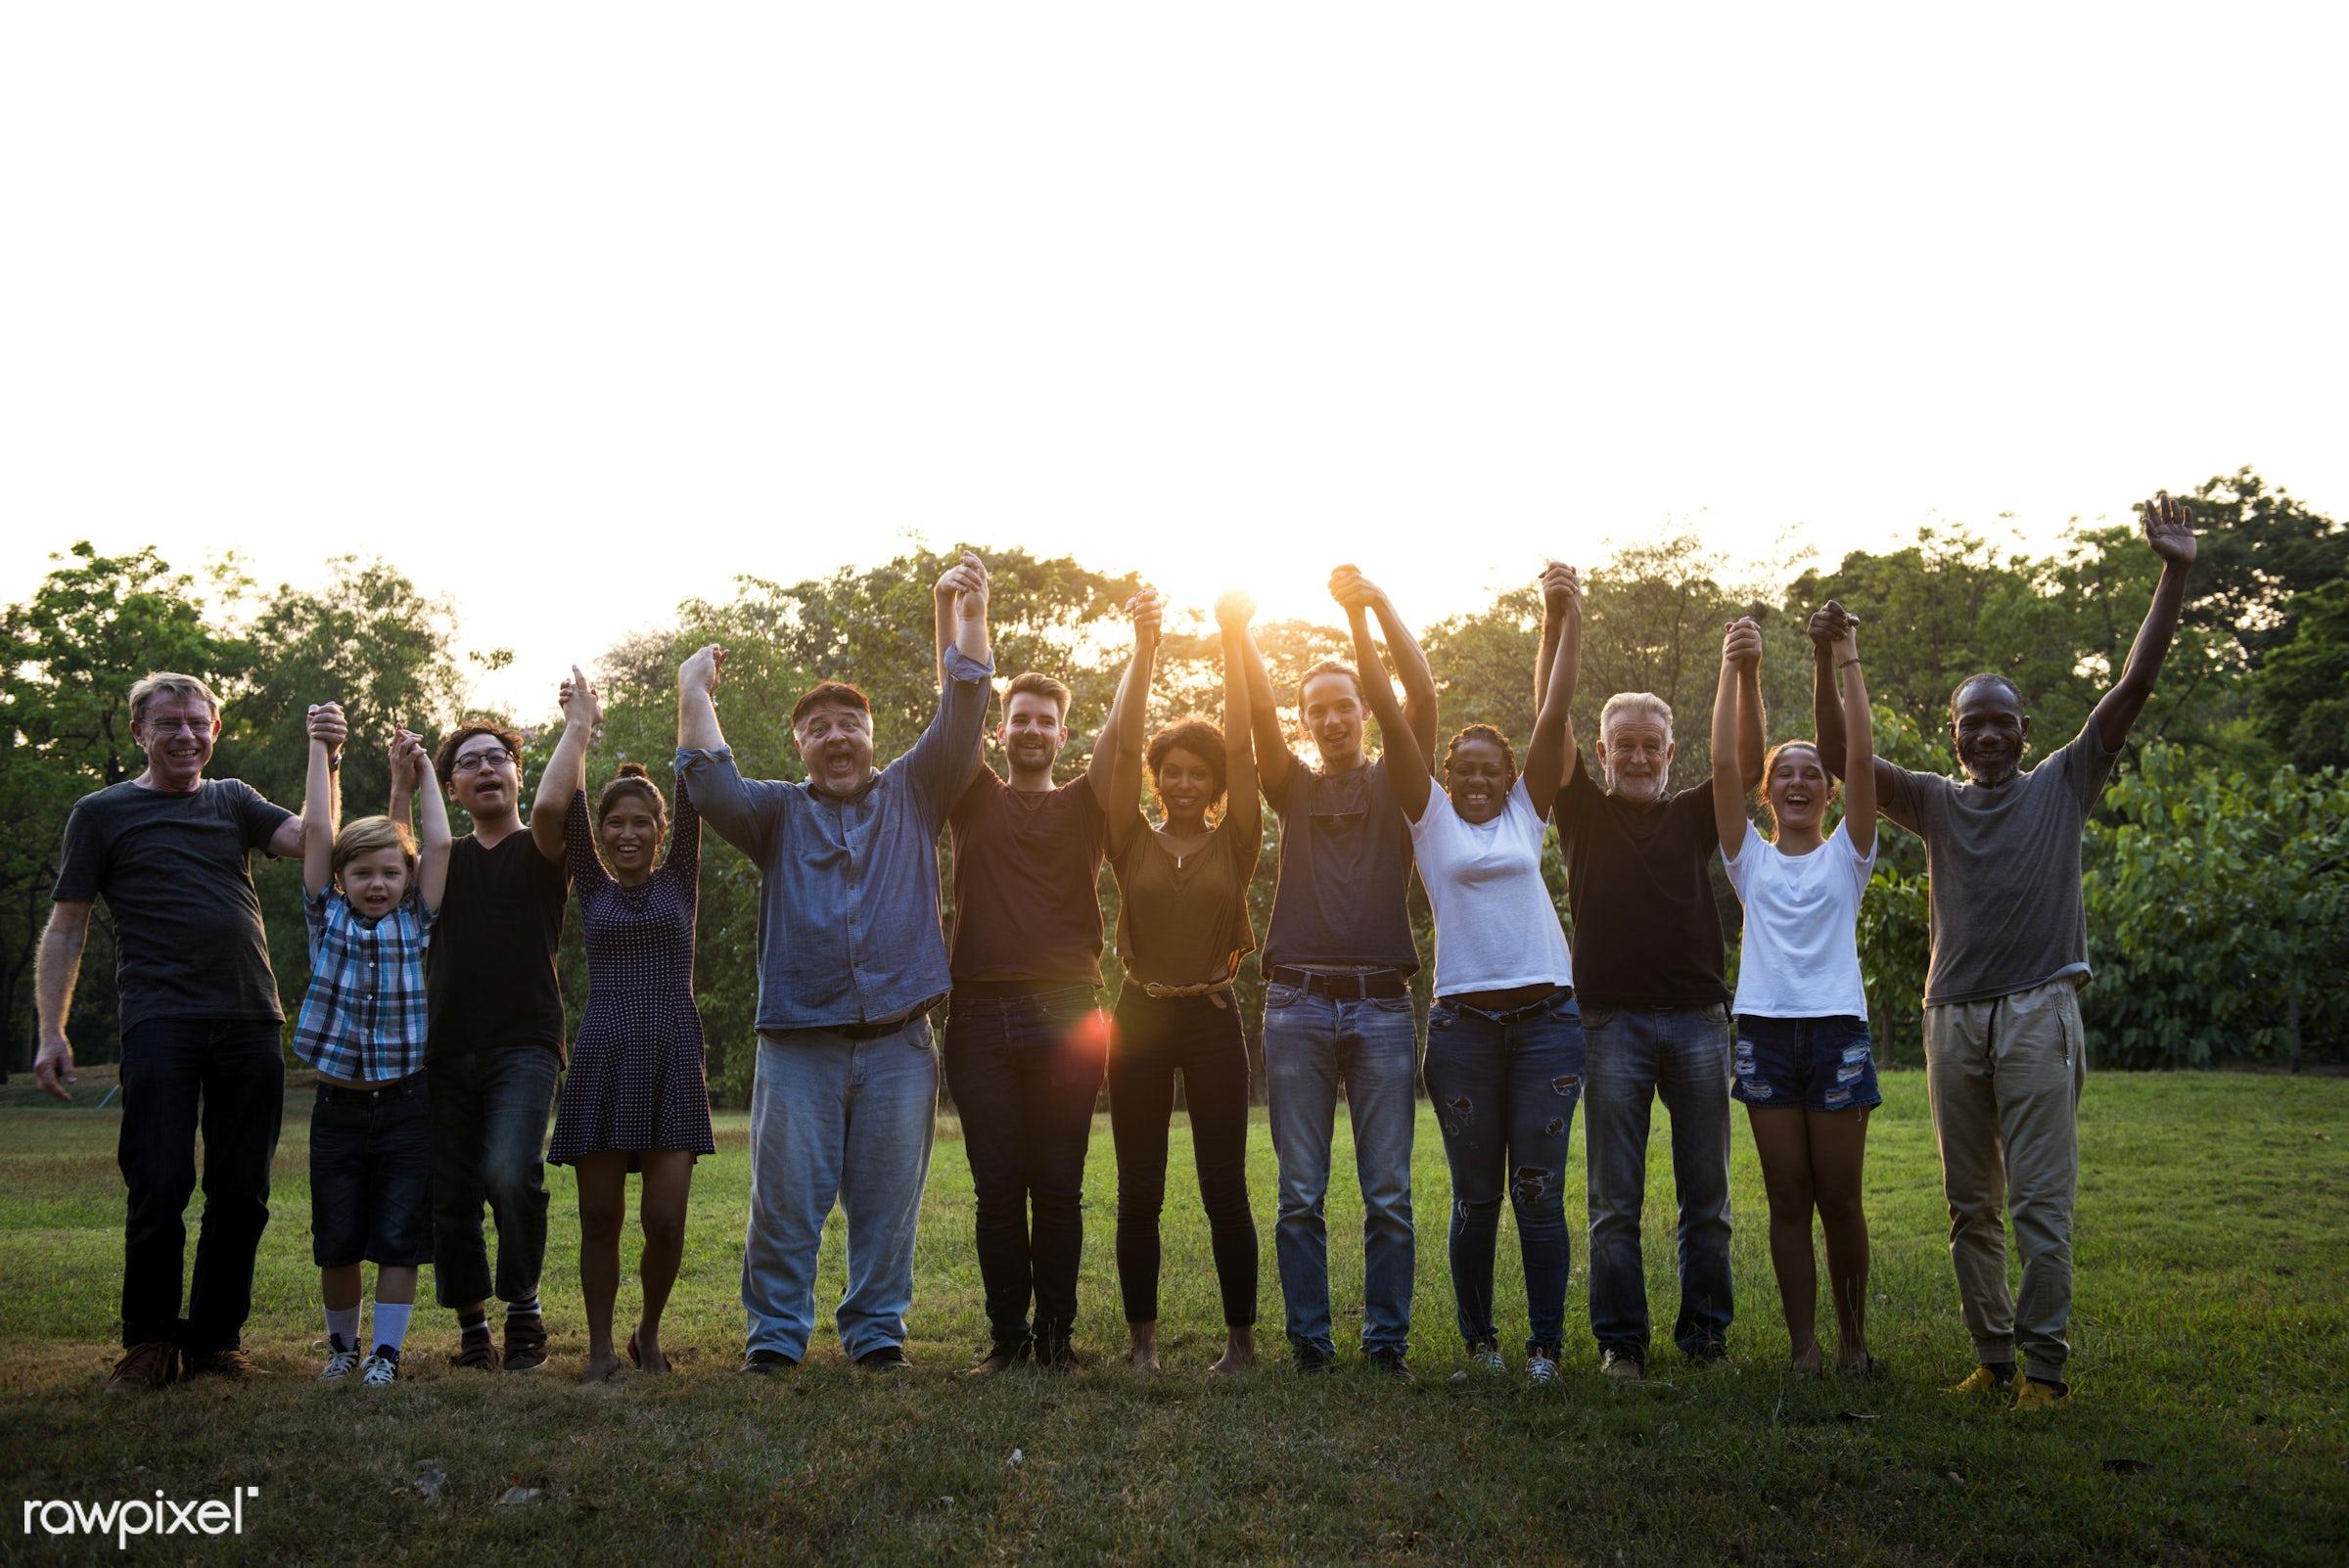 person, save, hug, community service, corporation, people, together, kid, teamwork, help, nature, friendship, partner, go...